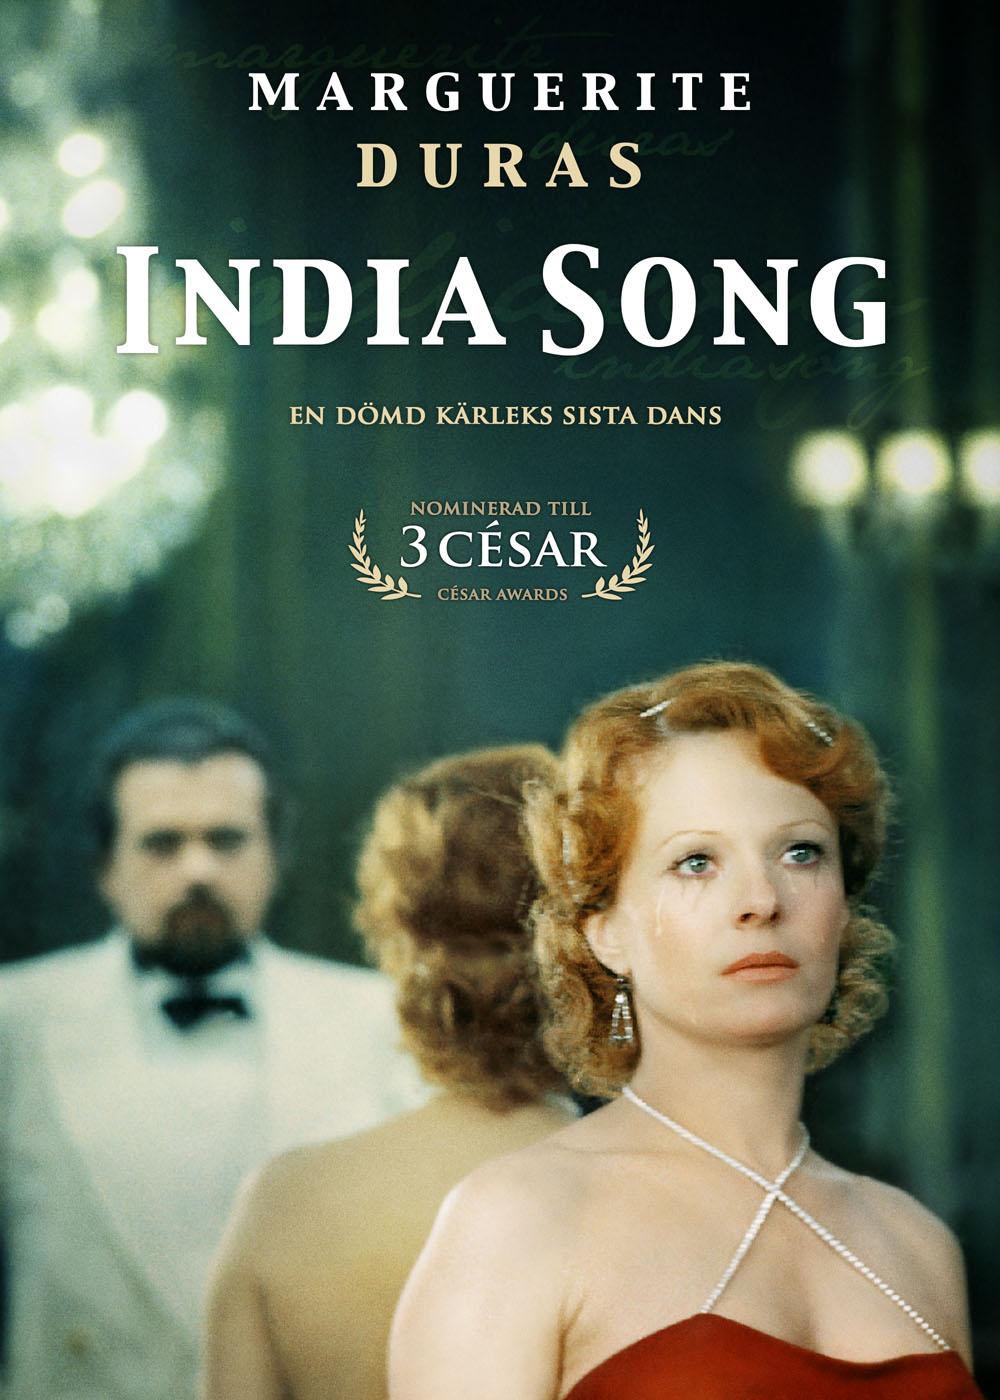 indiasong_poster.jpg